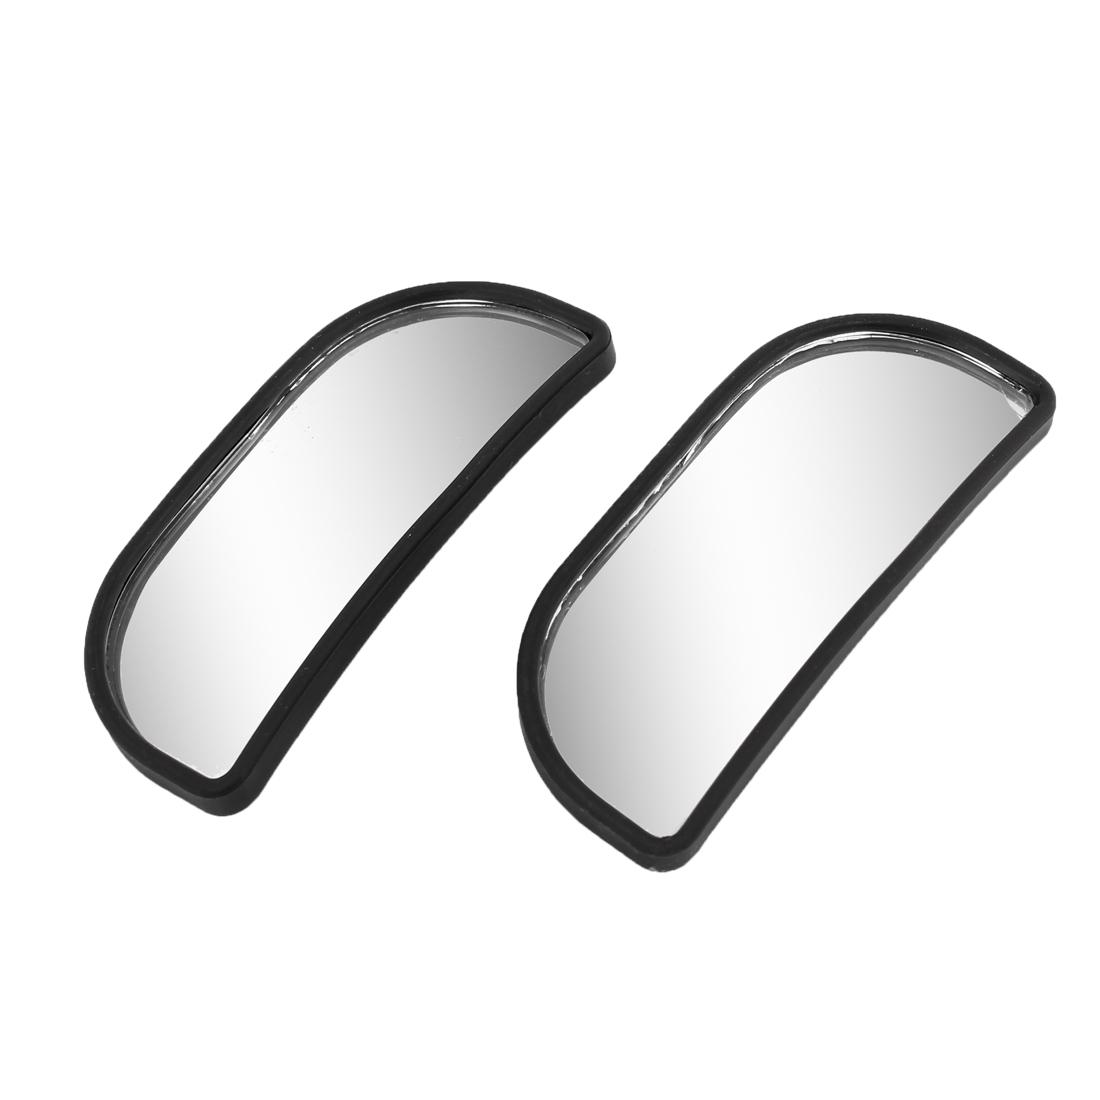 2 Pcs 8 x 3cm Black Plastic Frame Rearview Blind Spot Wide Mirror for Car